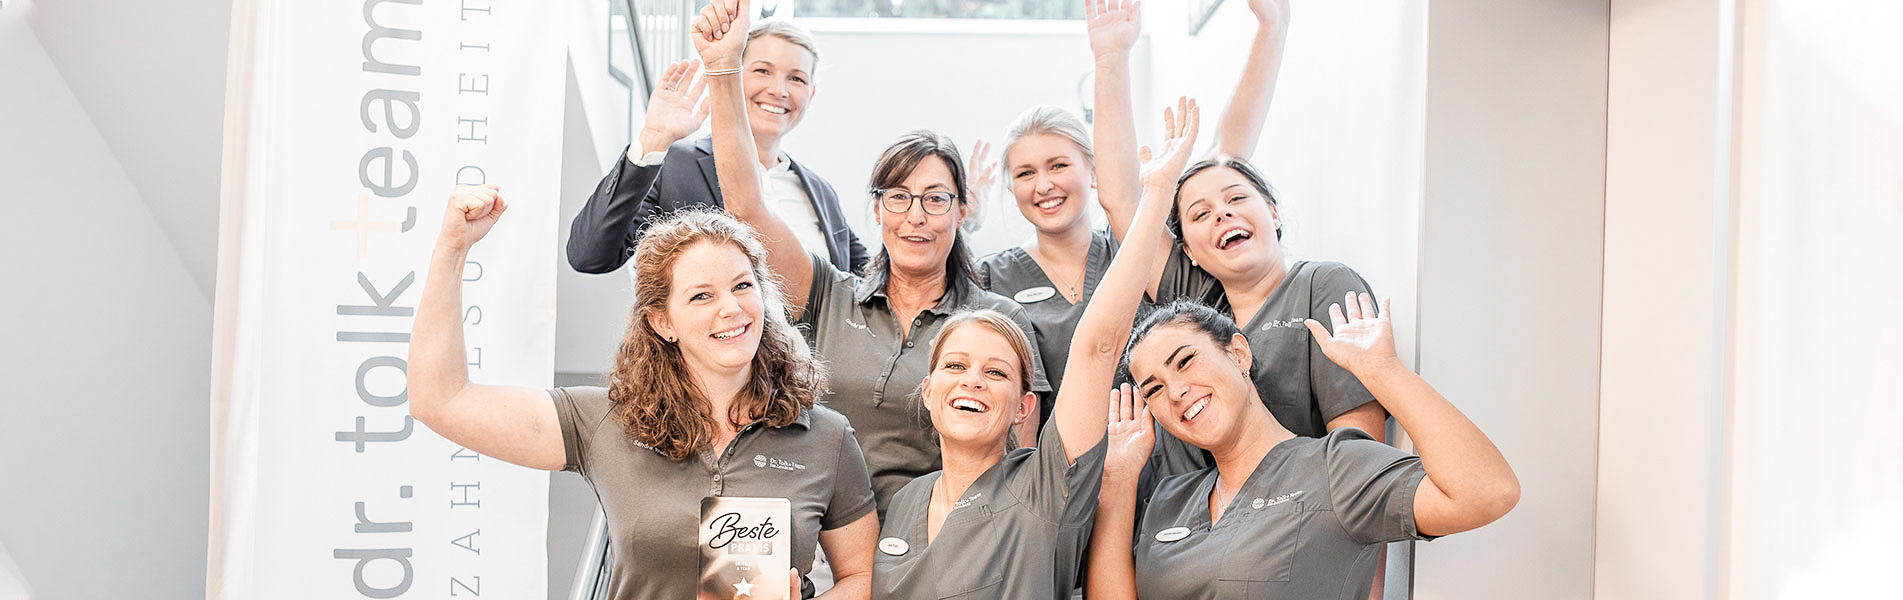 Unser Team- Zahnarztpraxis Dr. Tolk + Team in Kreuzau bei Düren